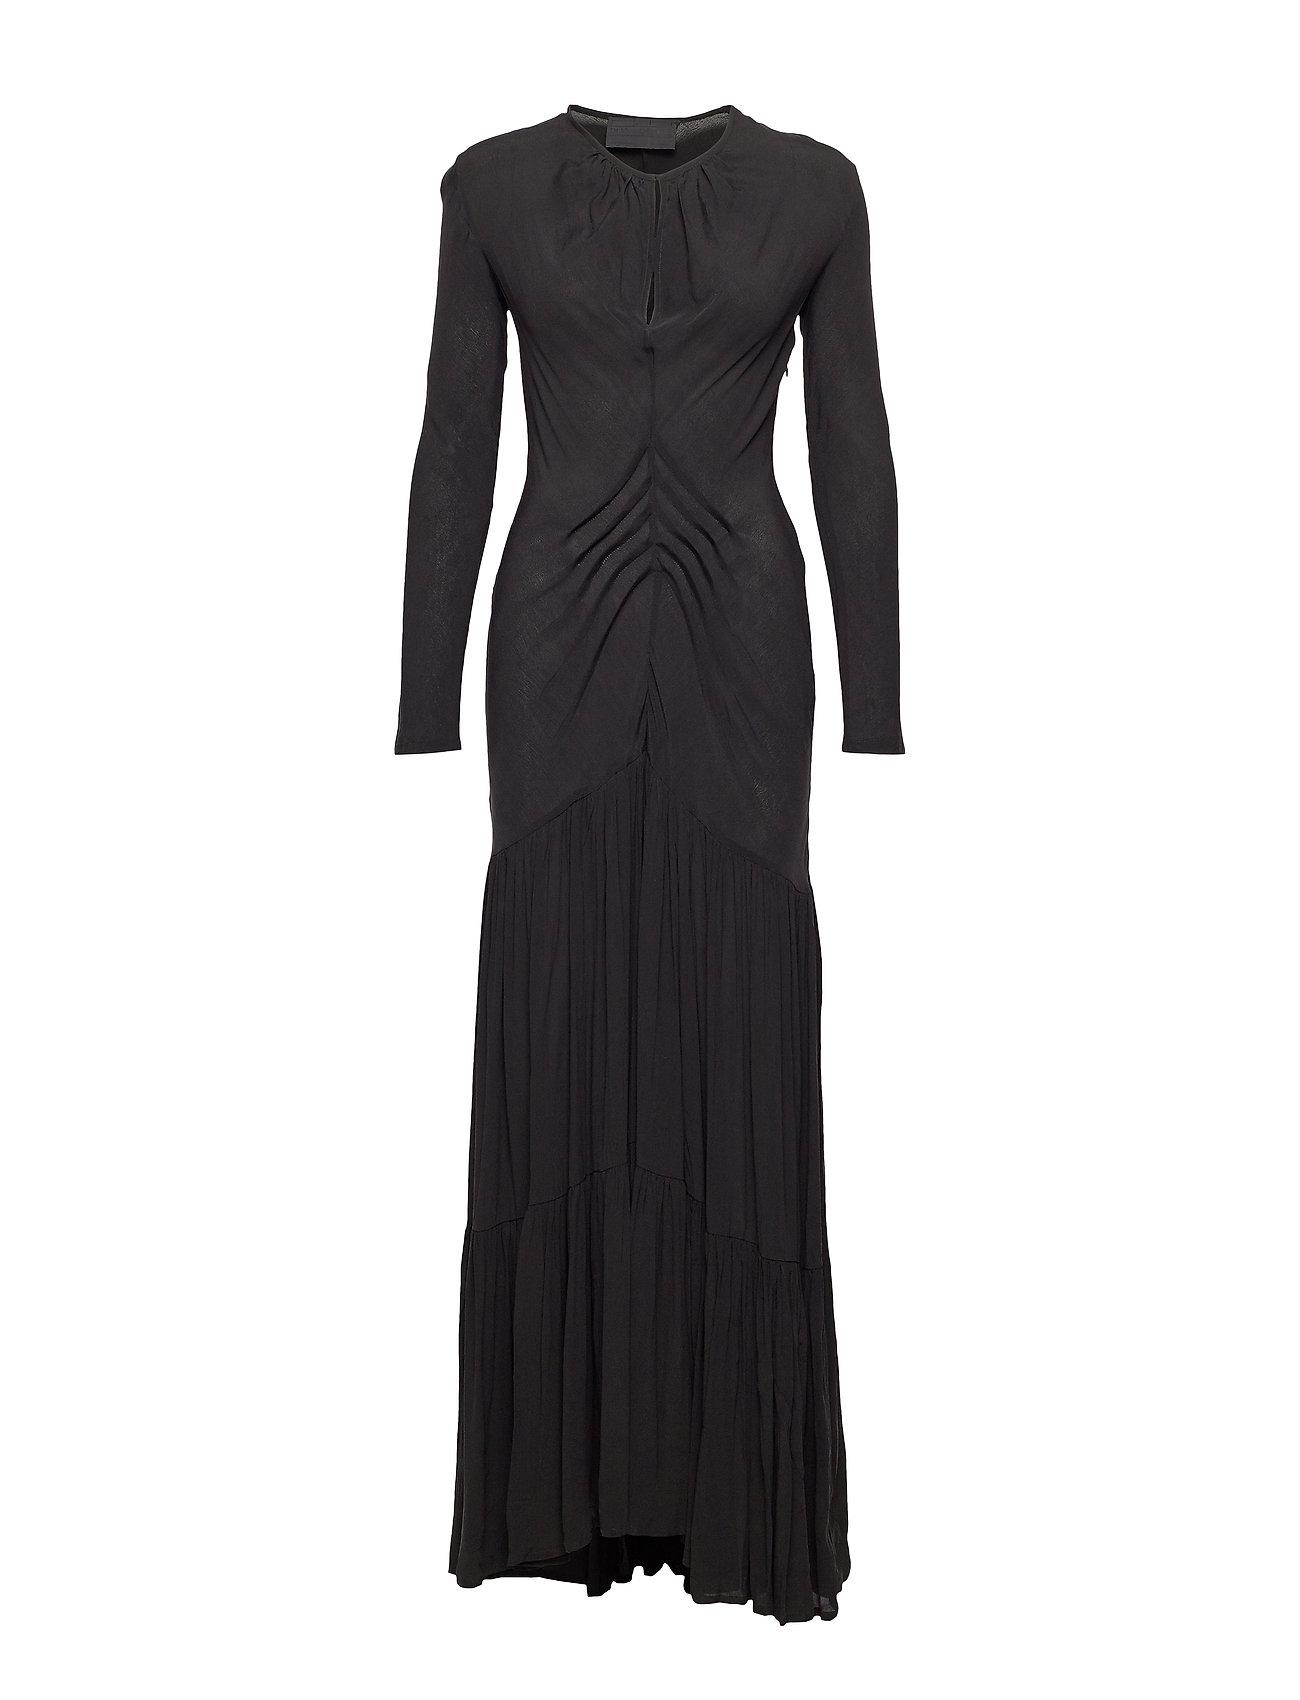 Diana Orving Level Bias dress - BLACK